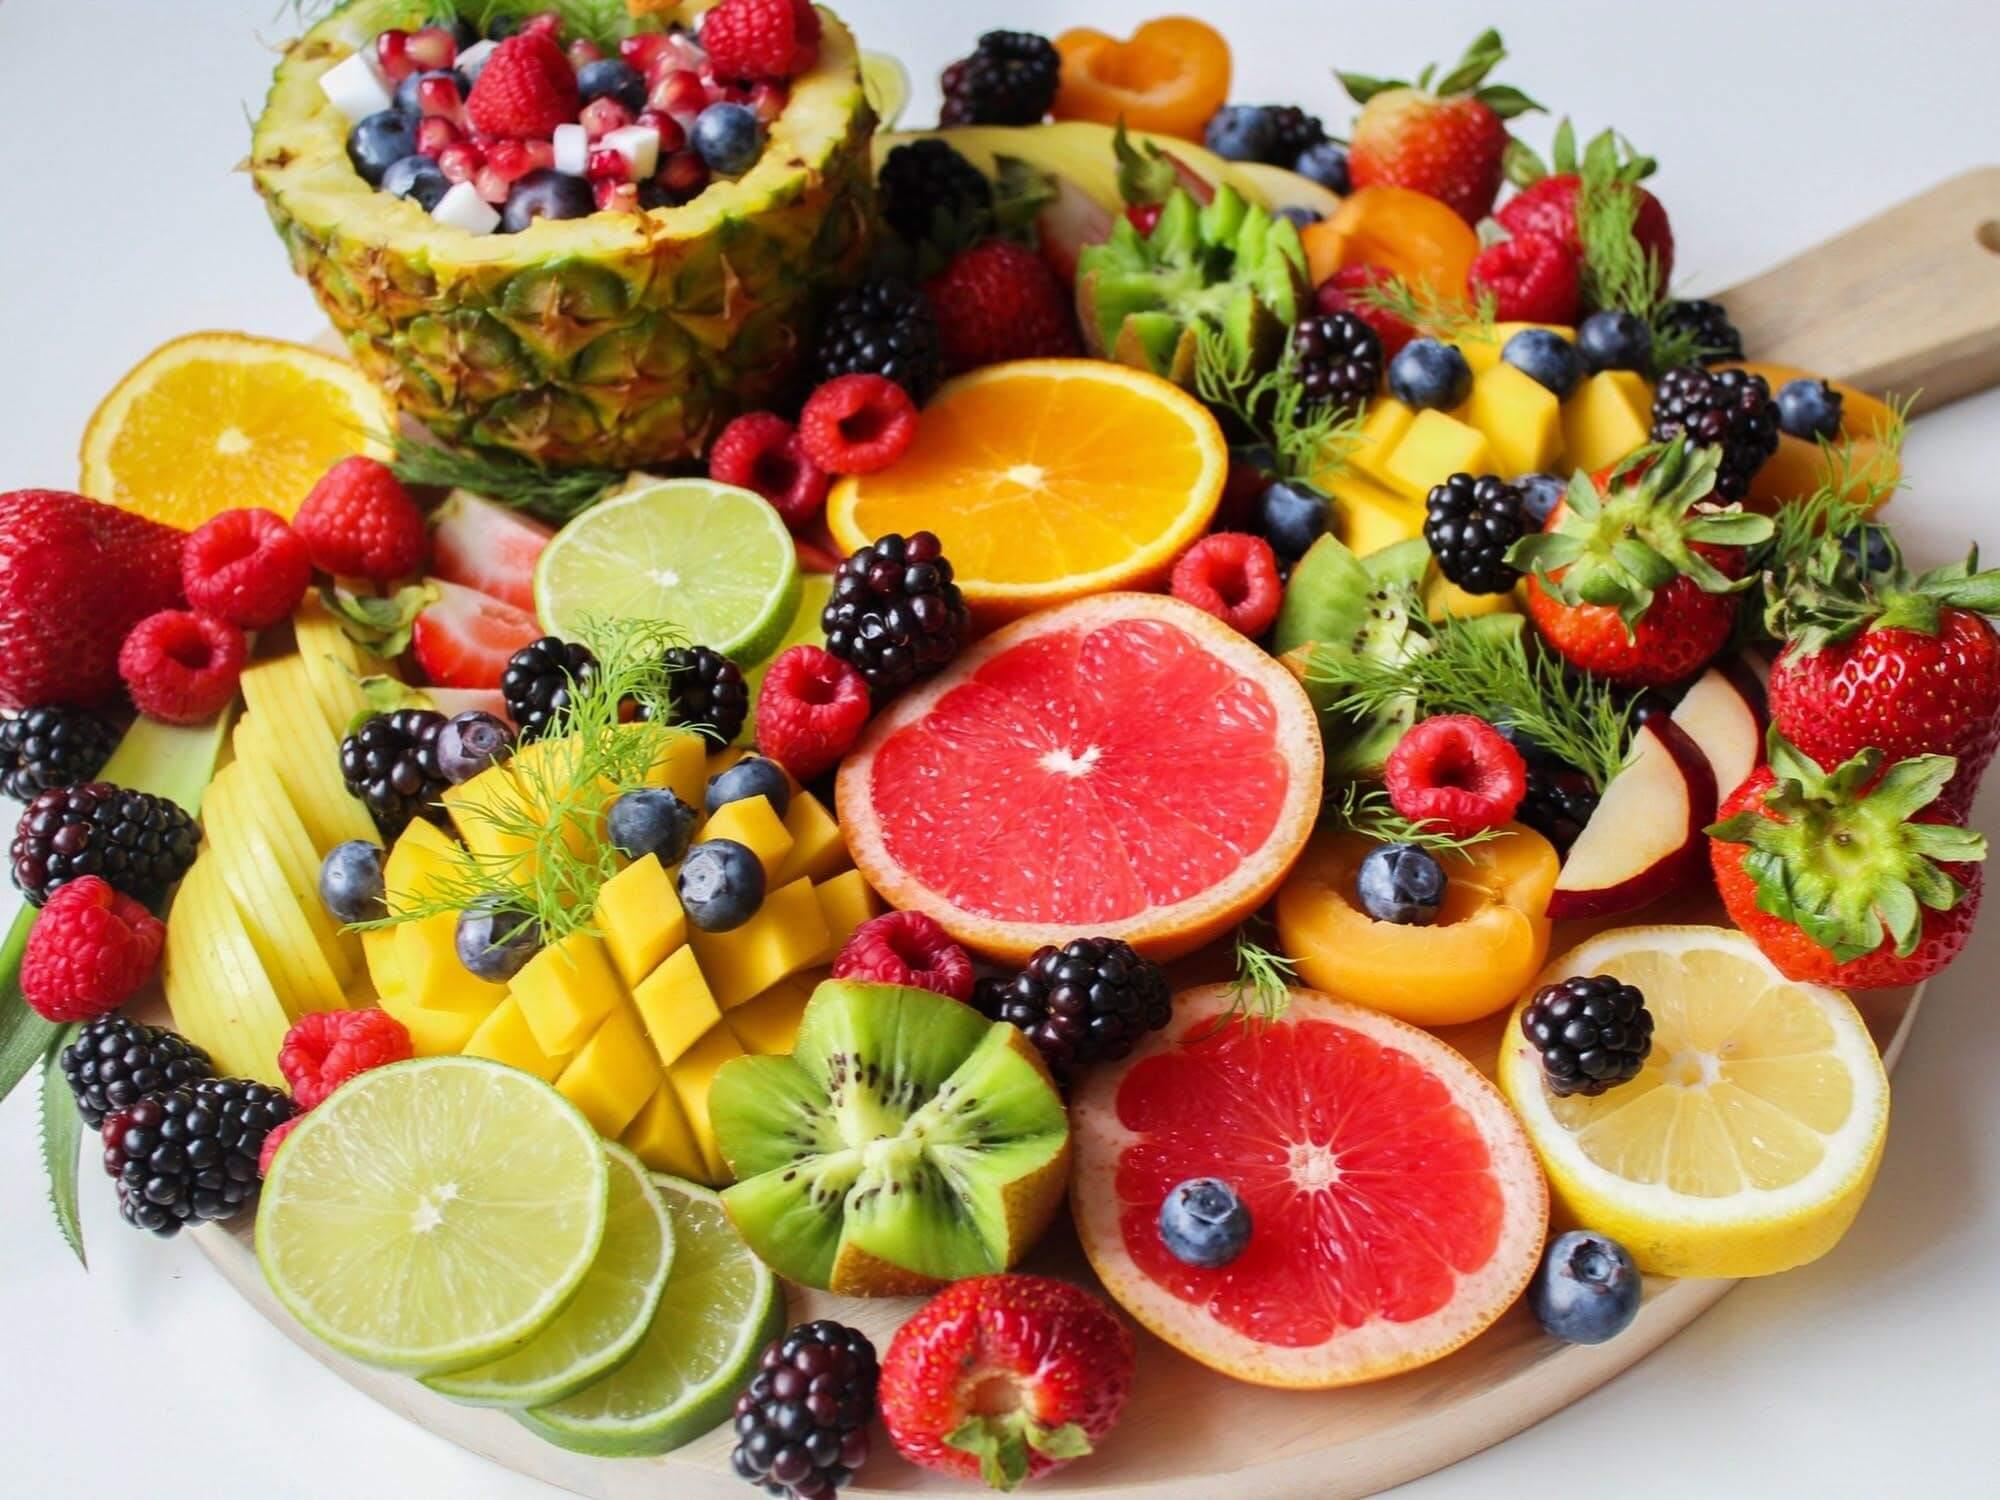 better eating habits